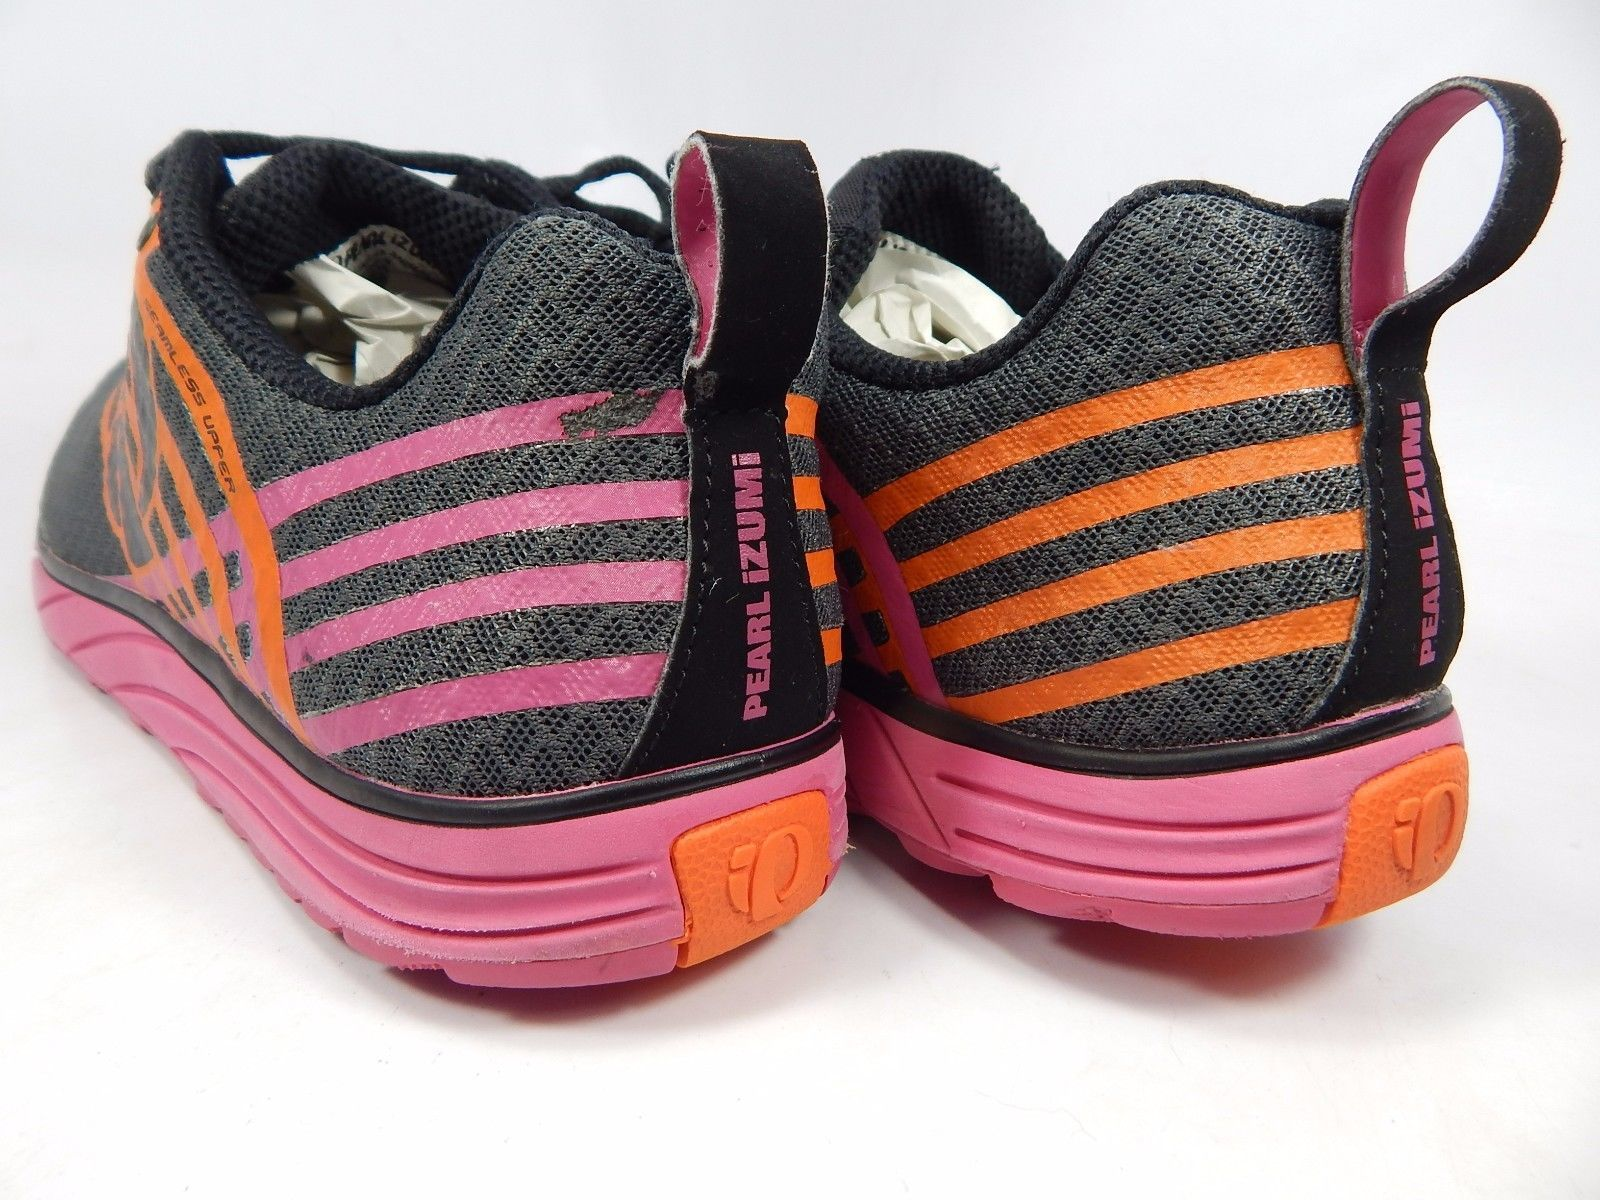 Pearl Izumi EM Trail N 1 Women's Trail Running Shoes Size US 11 M (B) EU 43 Gray